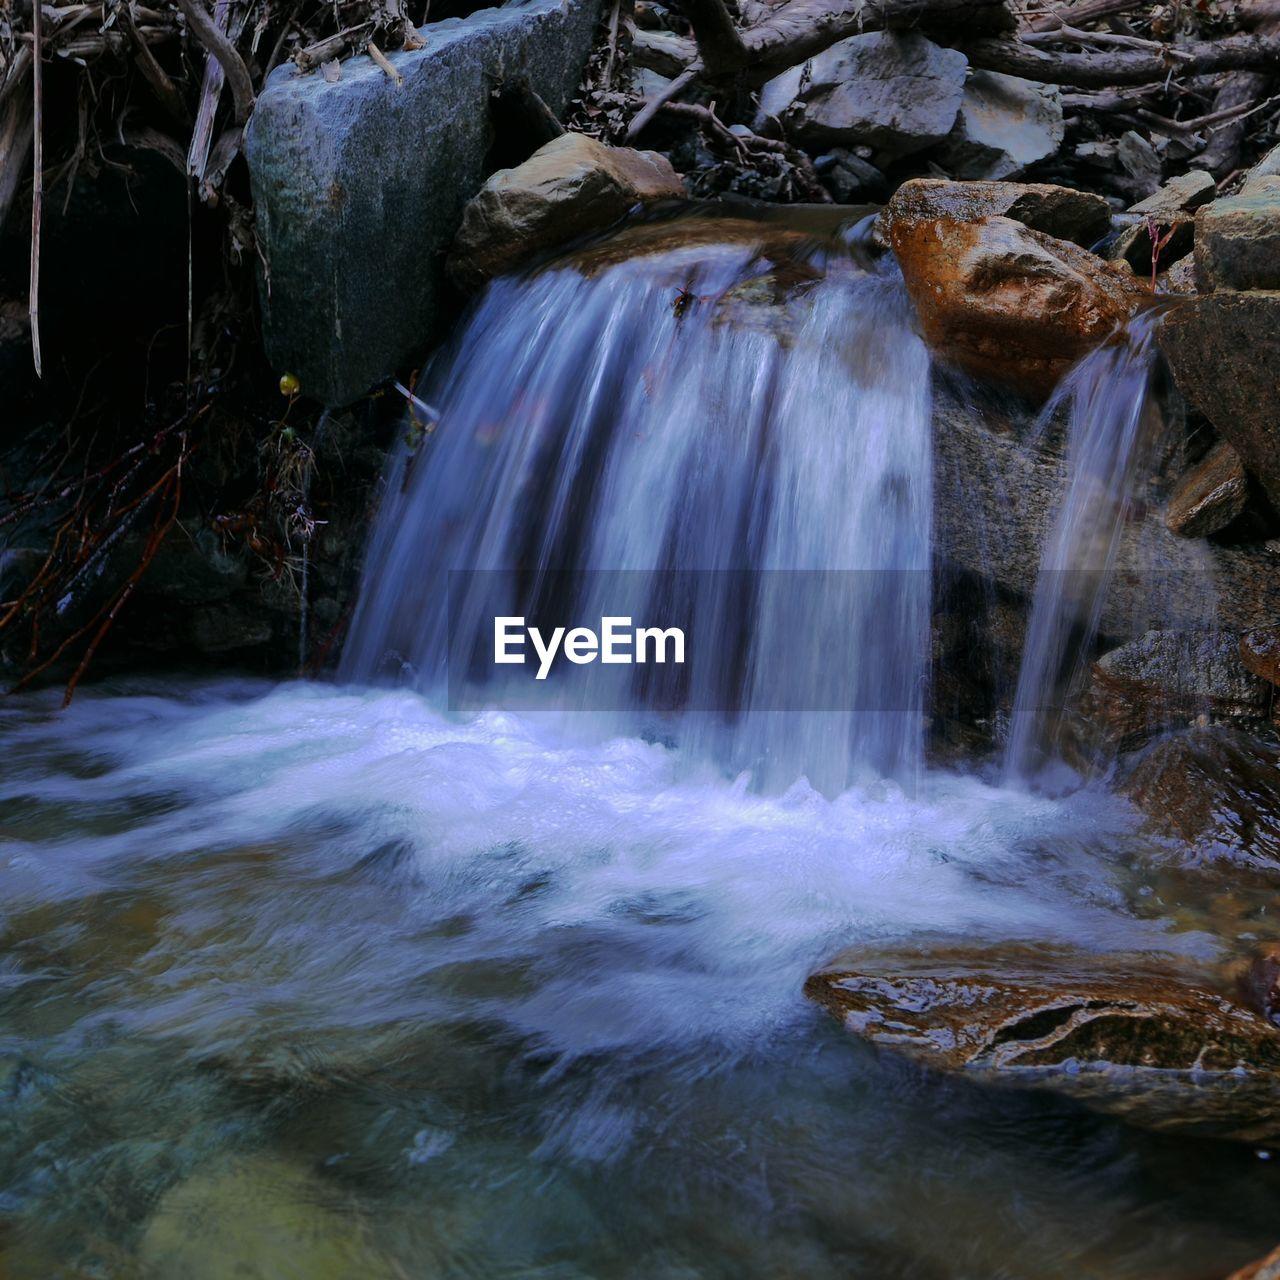 Water falling in river